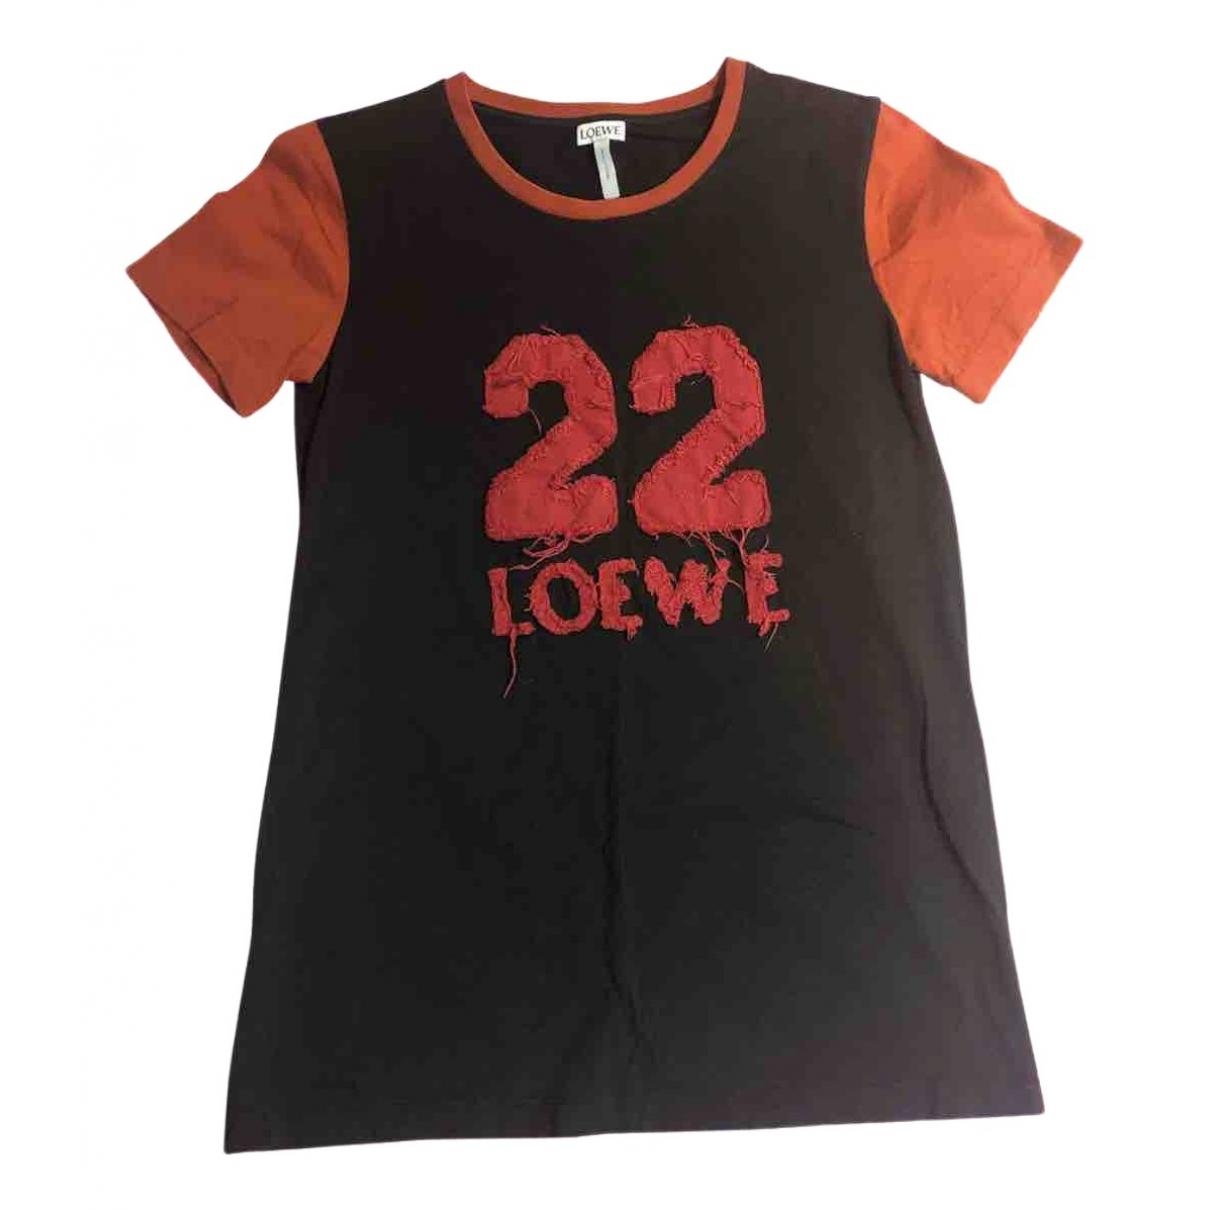 Loewe \N Black Cotton  top for Women S International